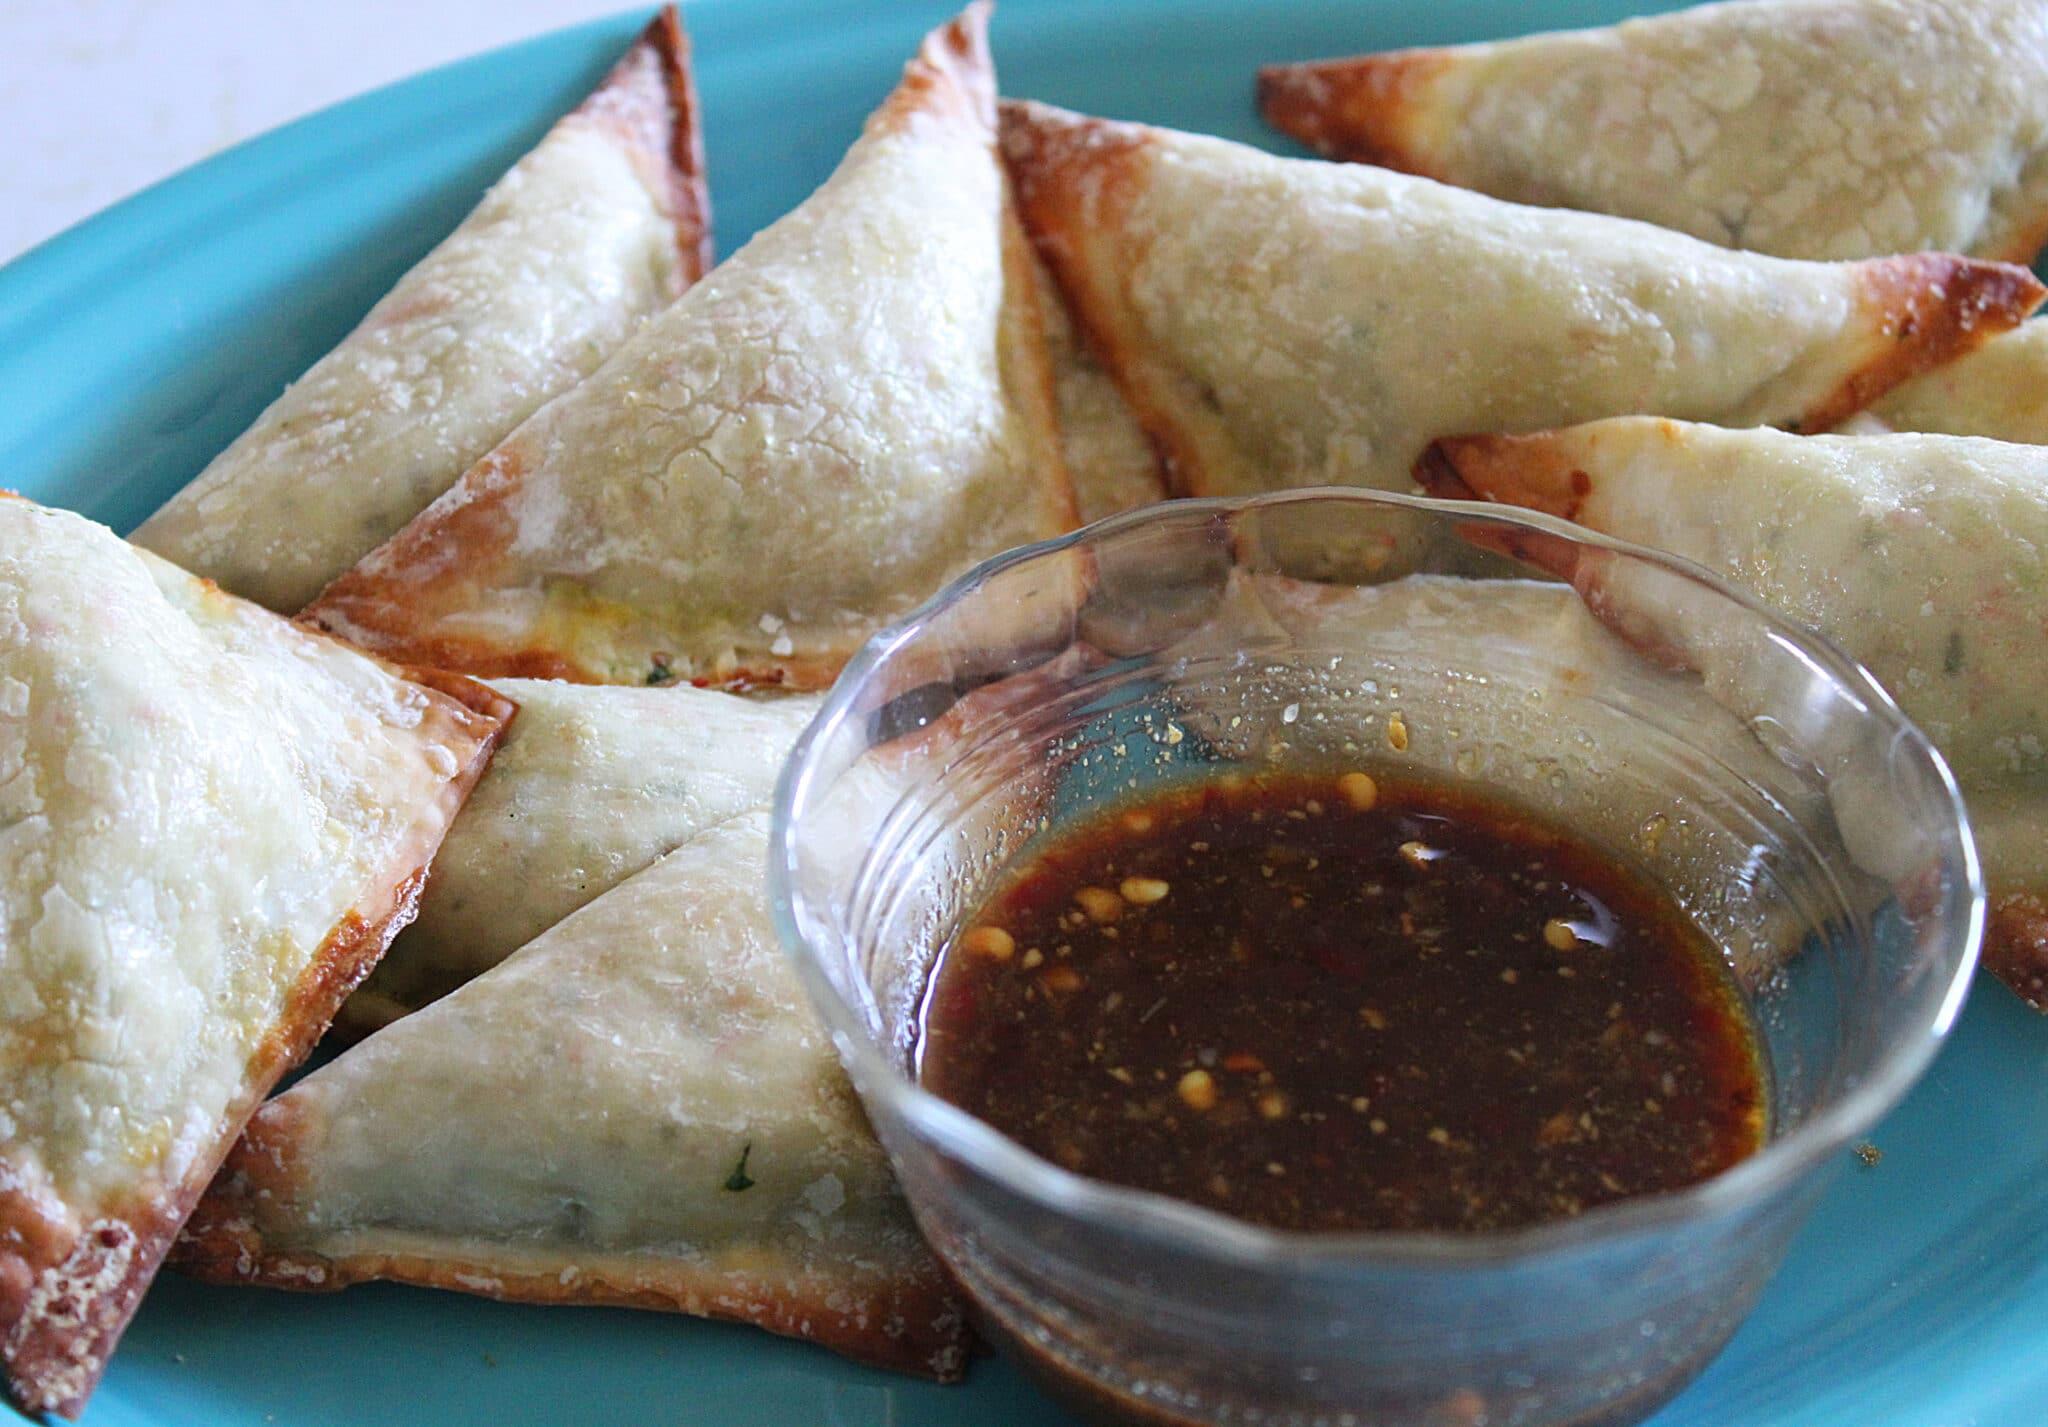 close up of spicy krab wonton with sweet mustard sauce